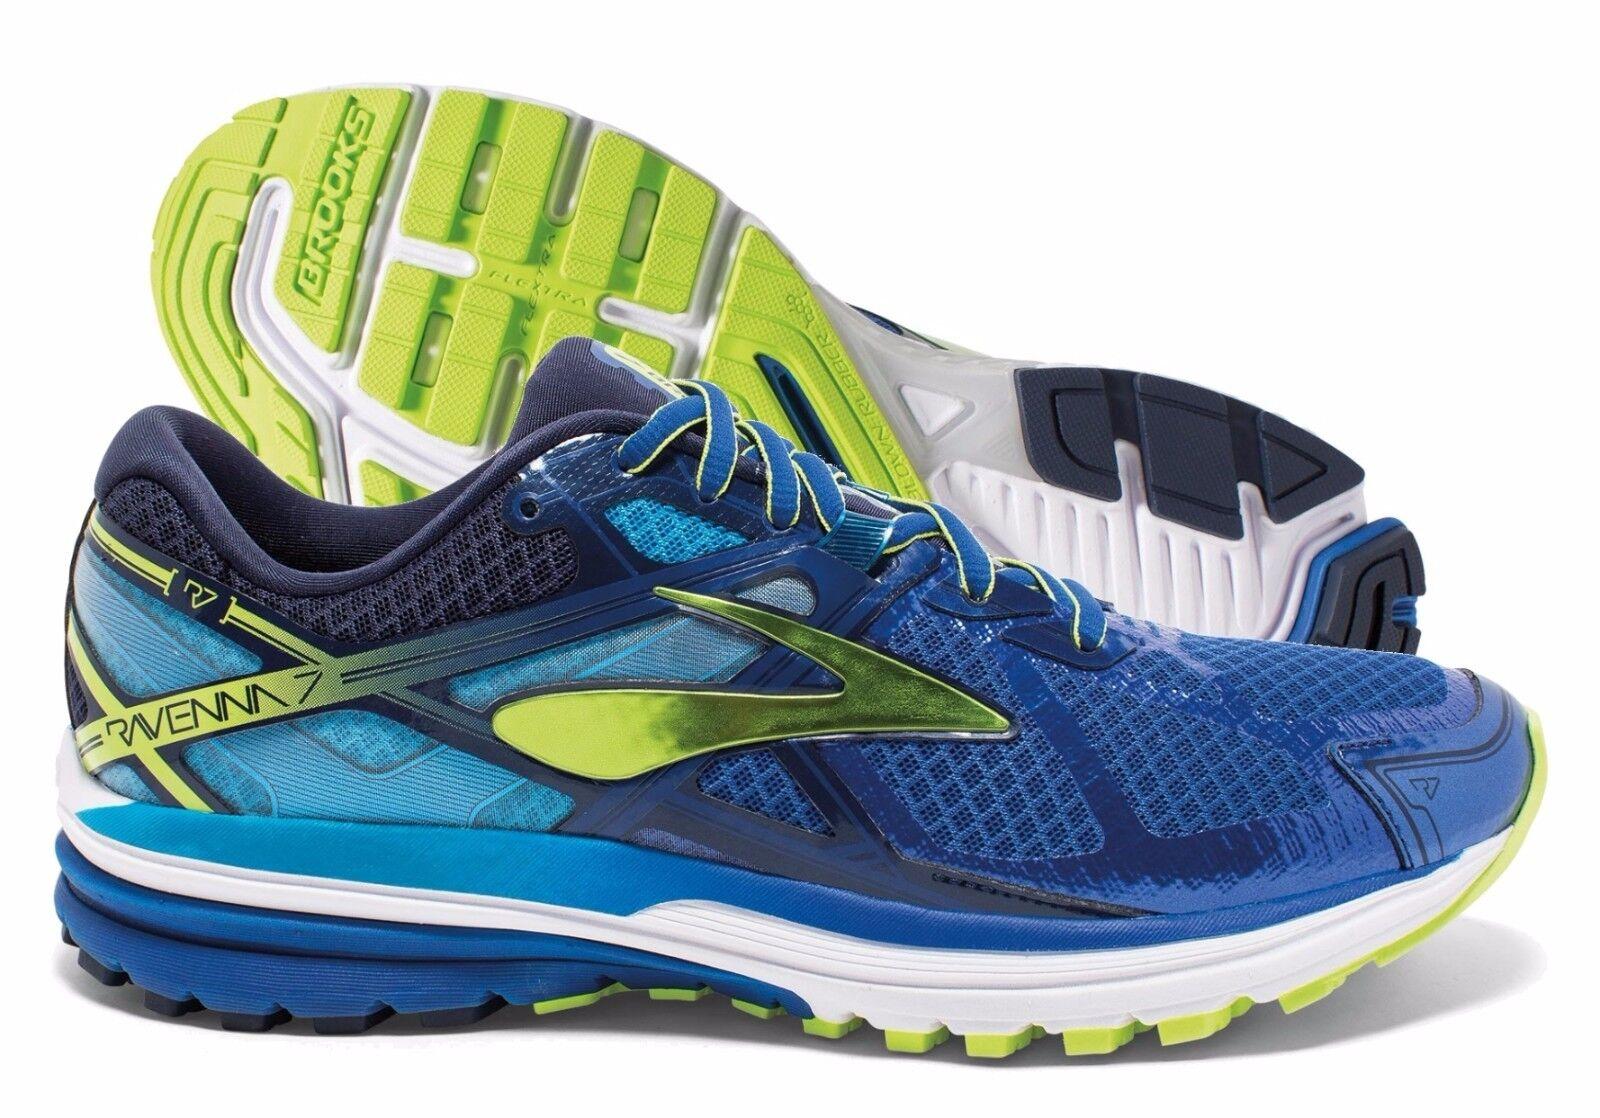 Scarpe casual da uomo  Brooks Ravenna 7 uomos Running Shoes (D) (484) + Free AUS Delivery!